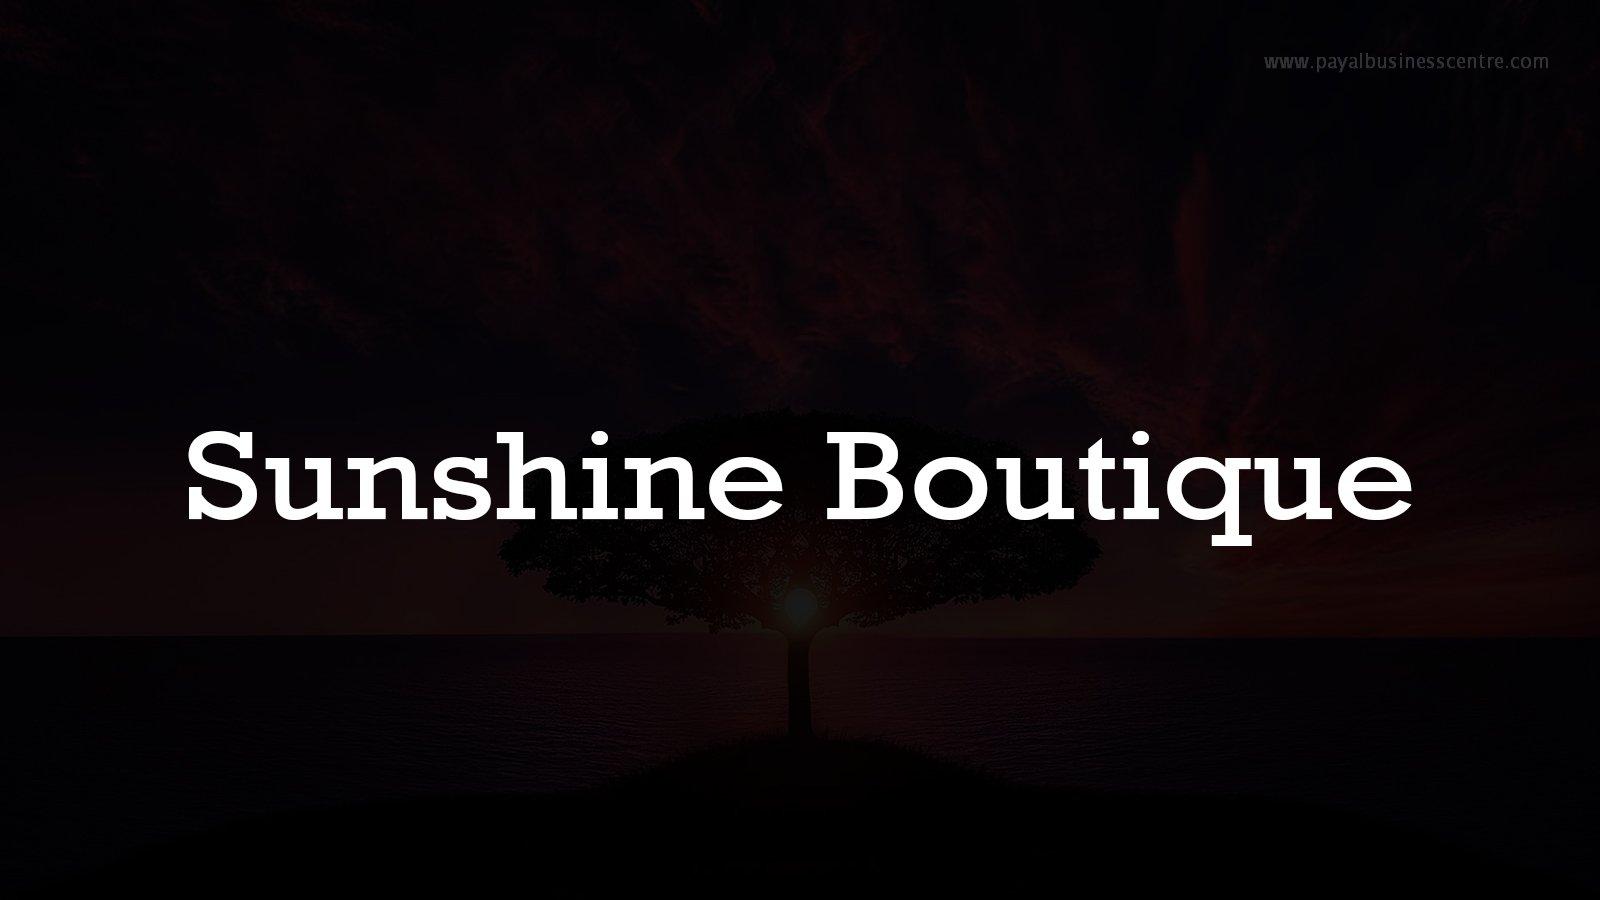 Sunshine Boutique - Clothing - 8128 128 St V3W 1R1 Surrey